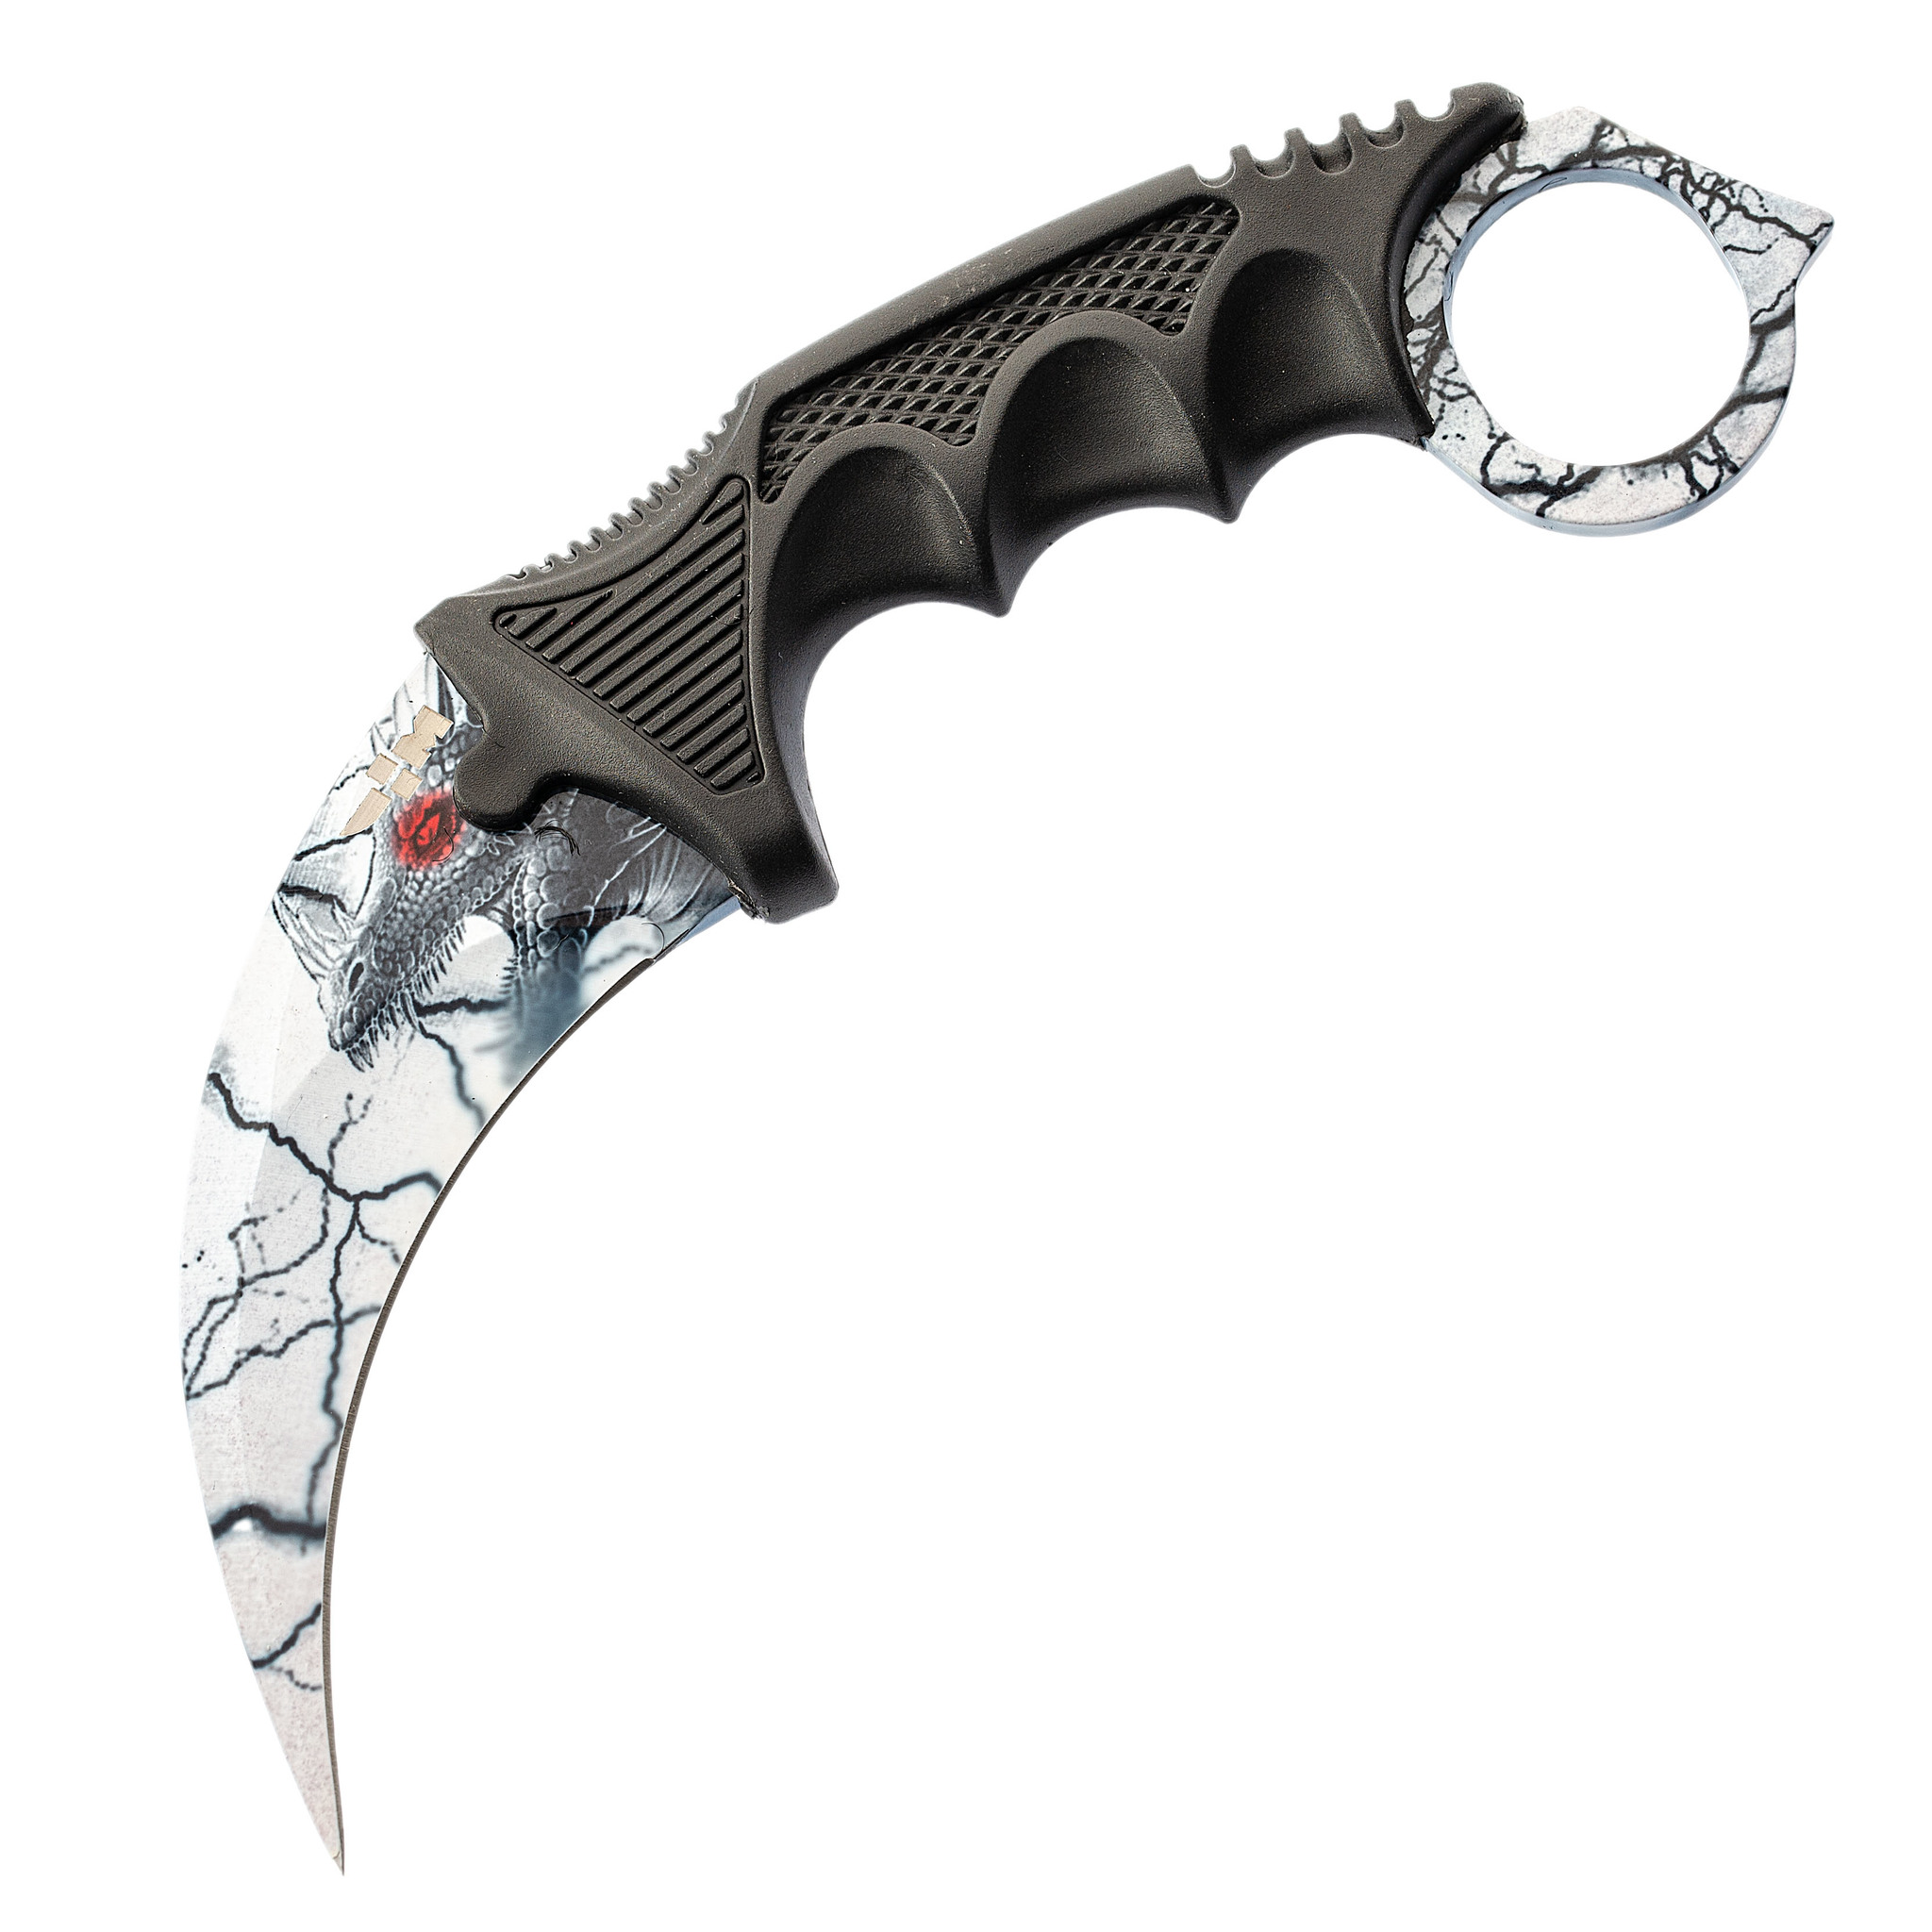 Нож CS GO керамбит Белый дракон от Ножемир